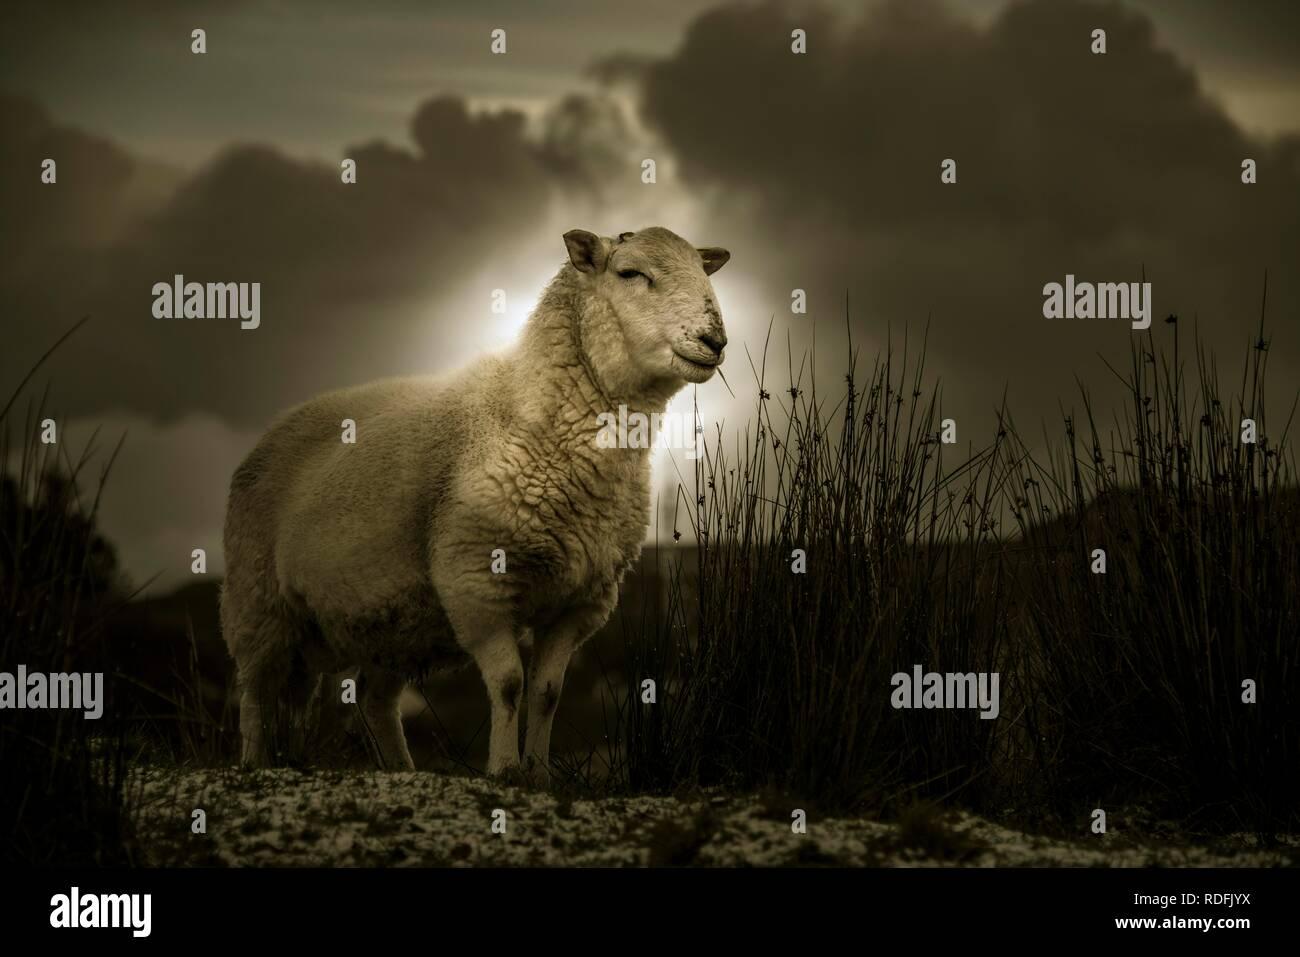 Scottish Domestic sheep (Ovis gmelini aries) in a meadow, Isle of Sky, Scotland, United Kingdom - Stock Image